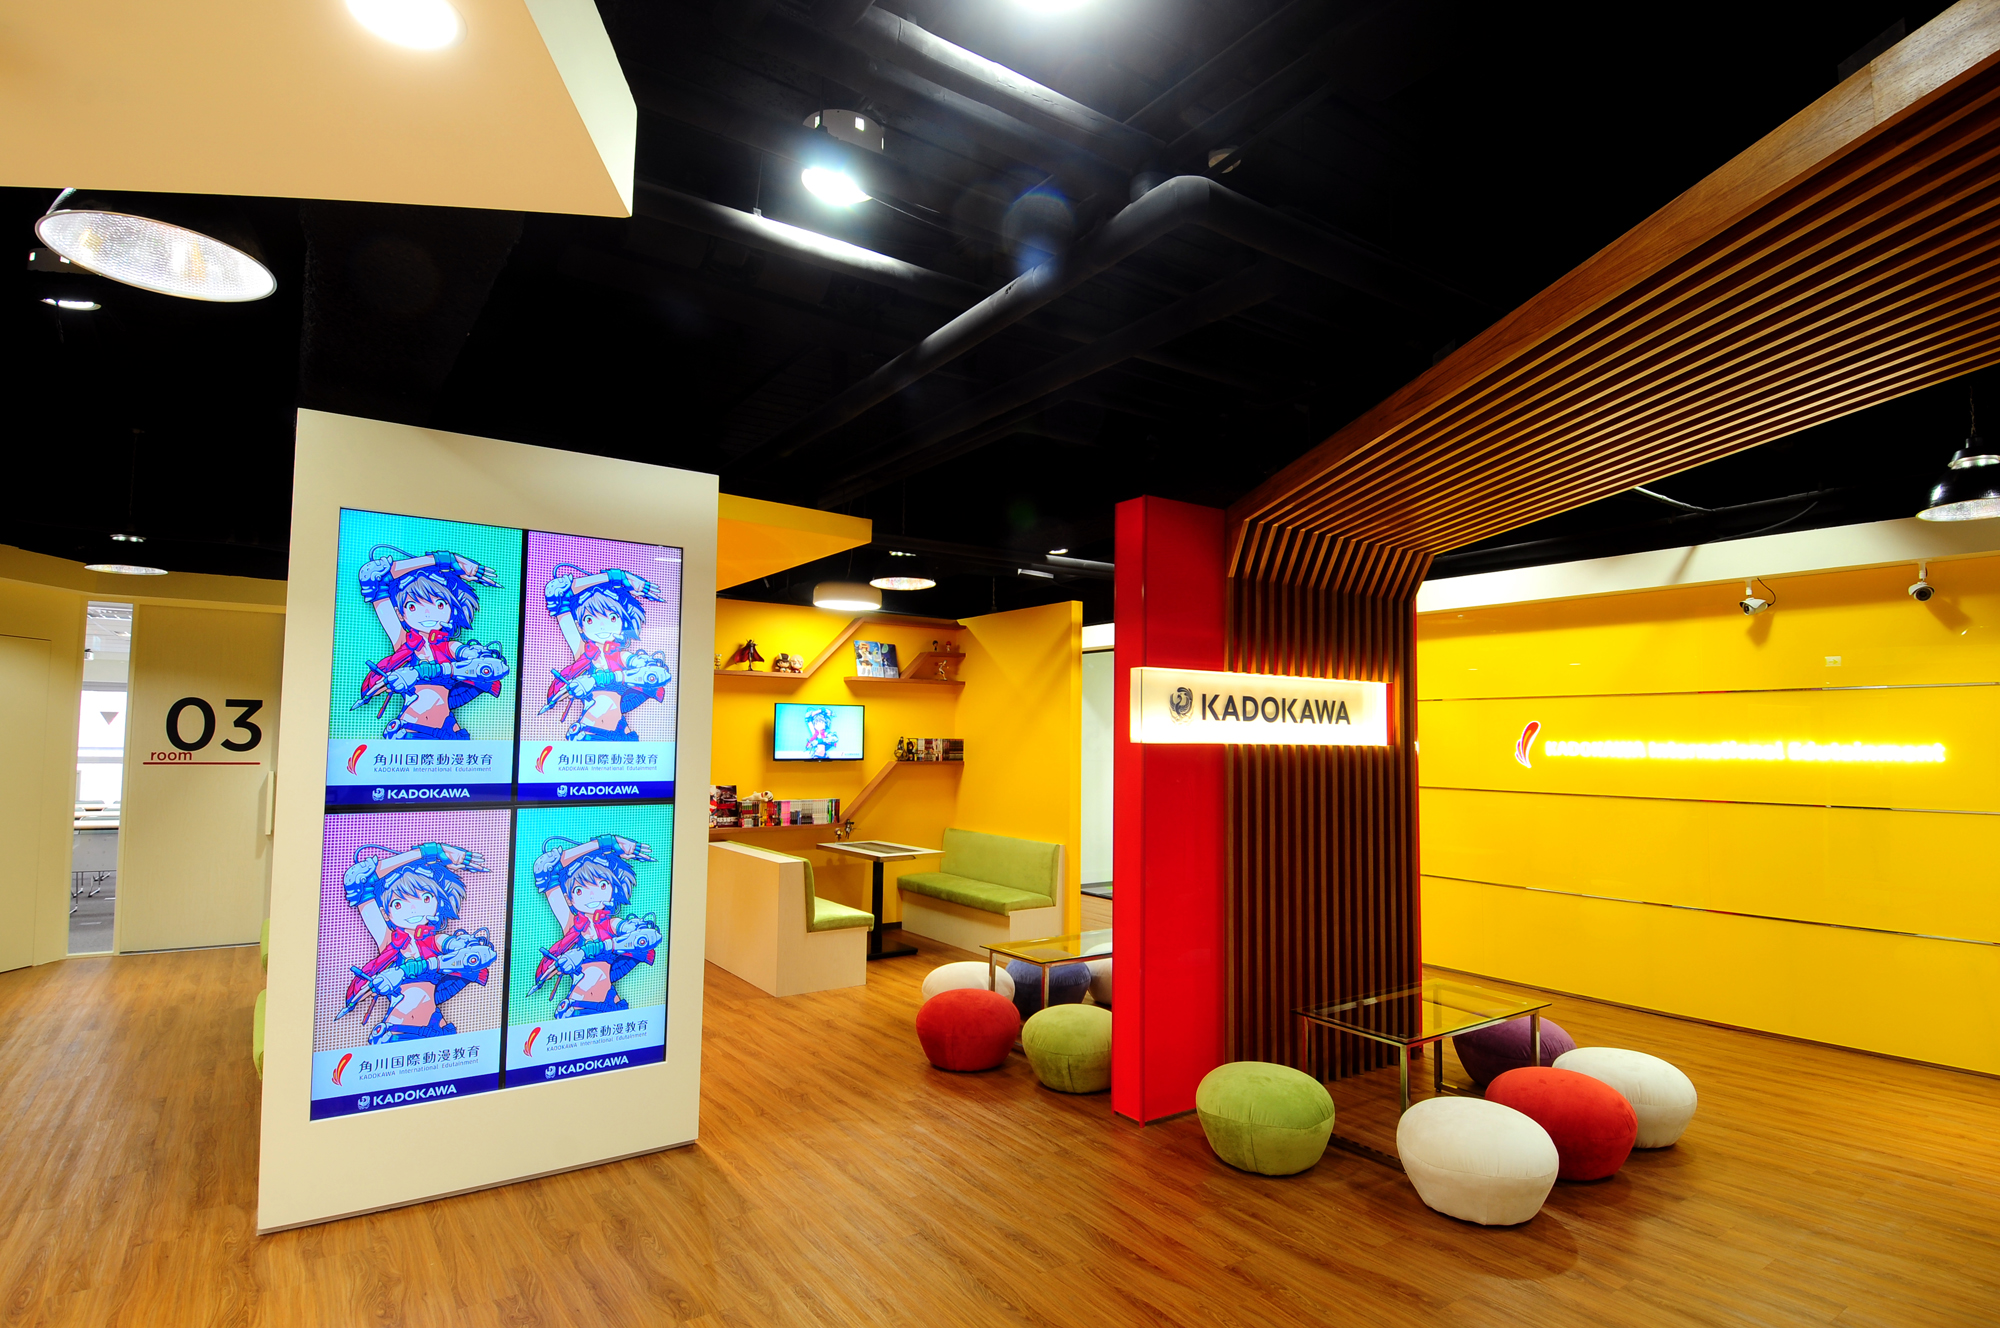 MUGENUP、シンガポールと台湾でゲームイラストに特化した教育カリキュラムを提供